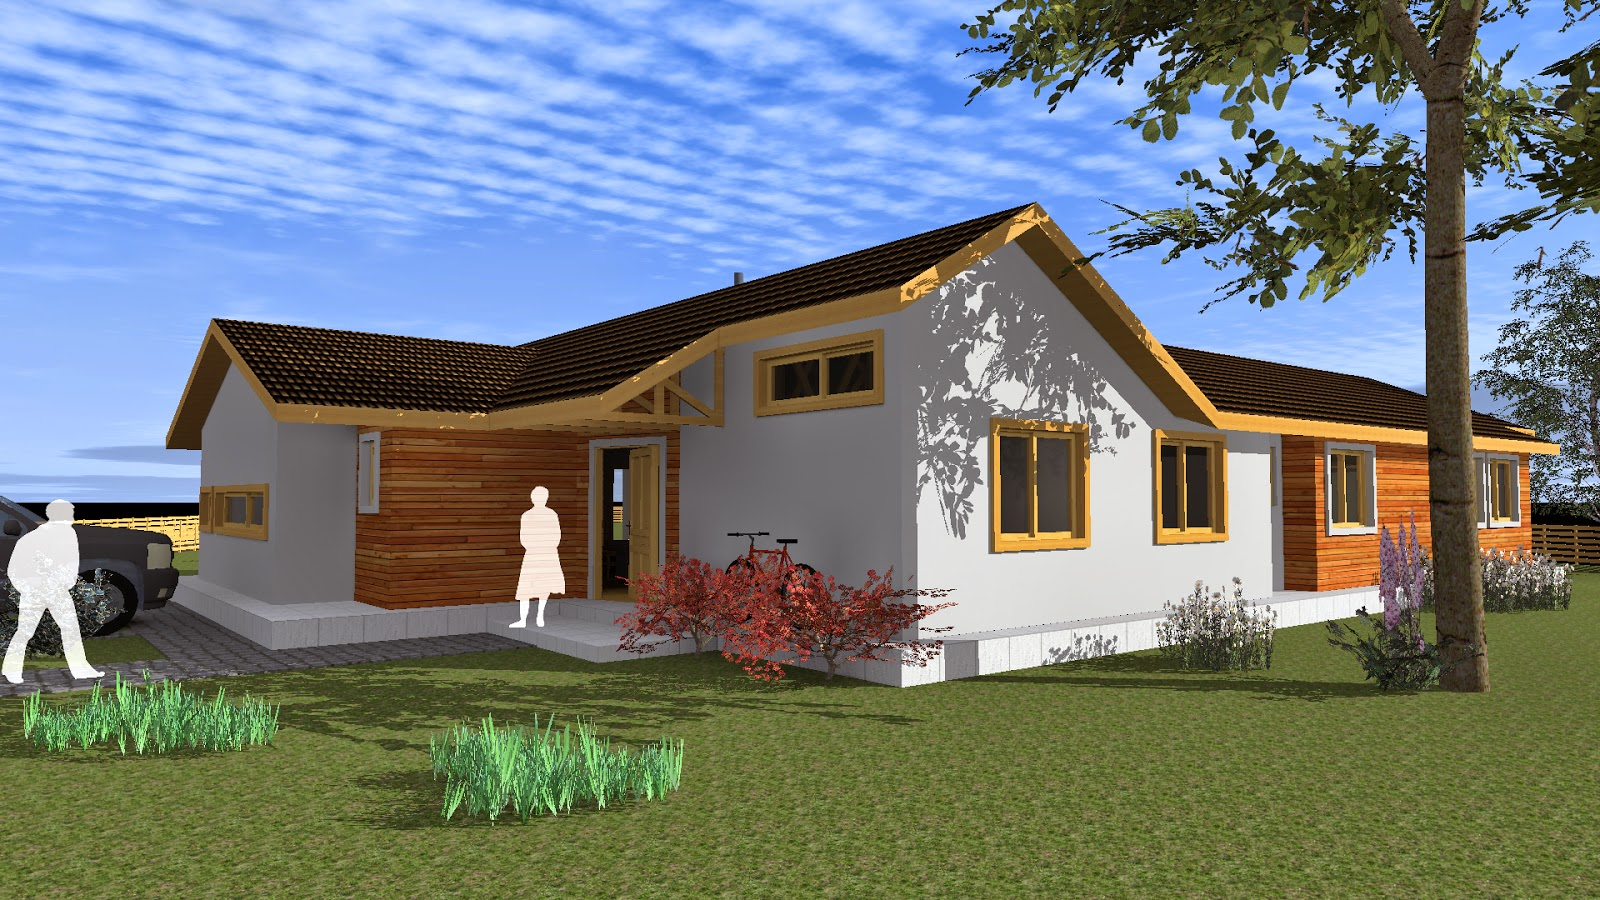 Casa De Campo 200 M2 Arquitecto Cristian Estrada Massera - Casas-de-campo-fotos